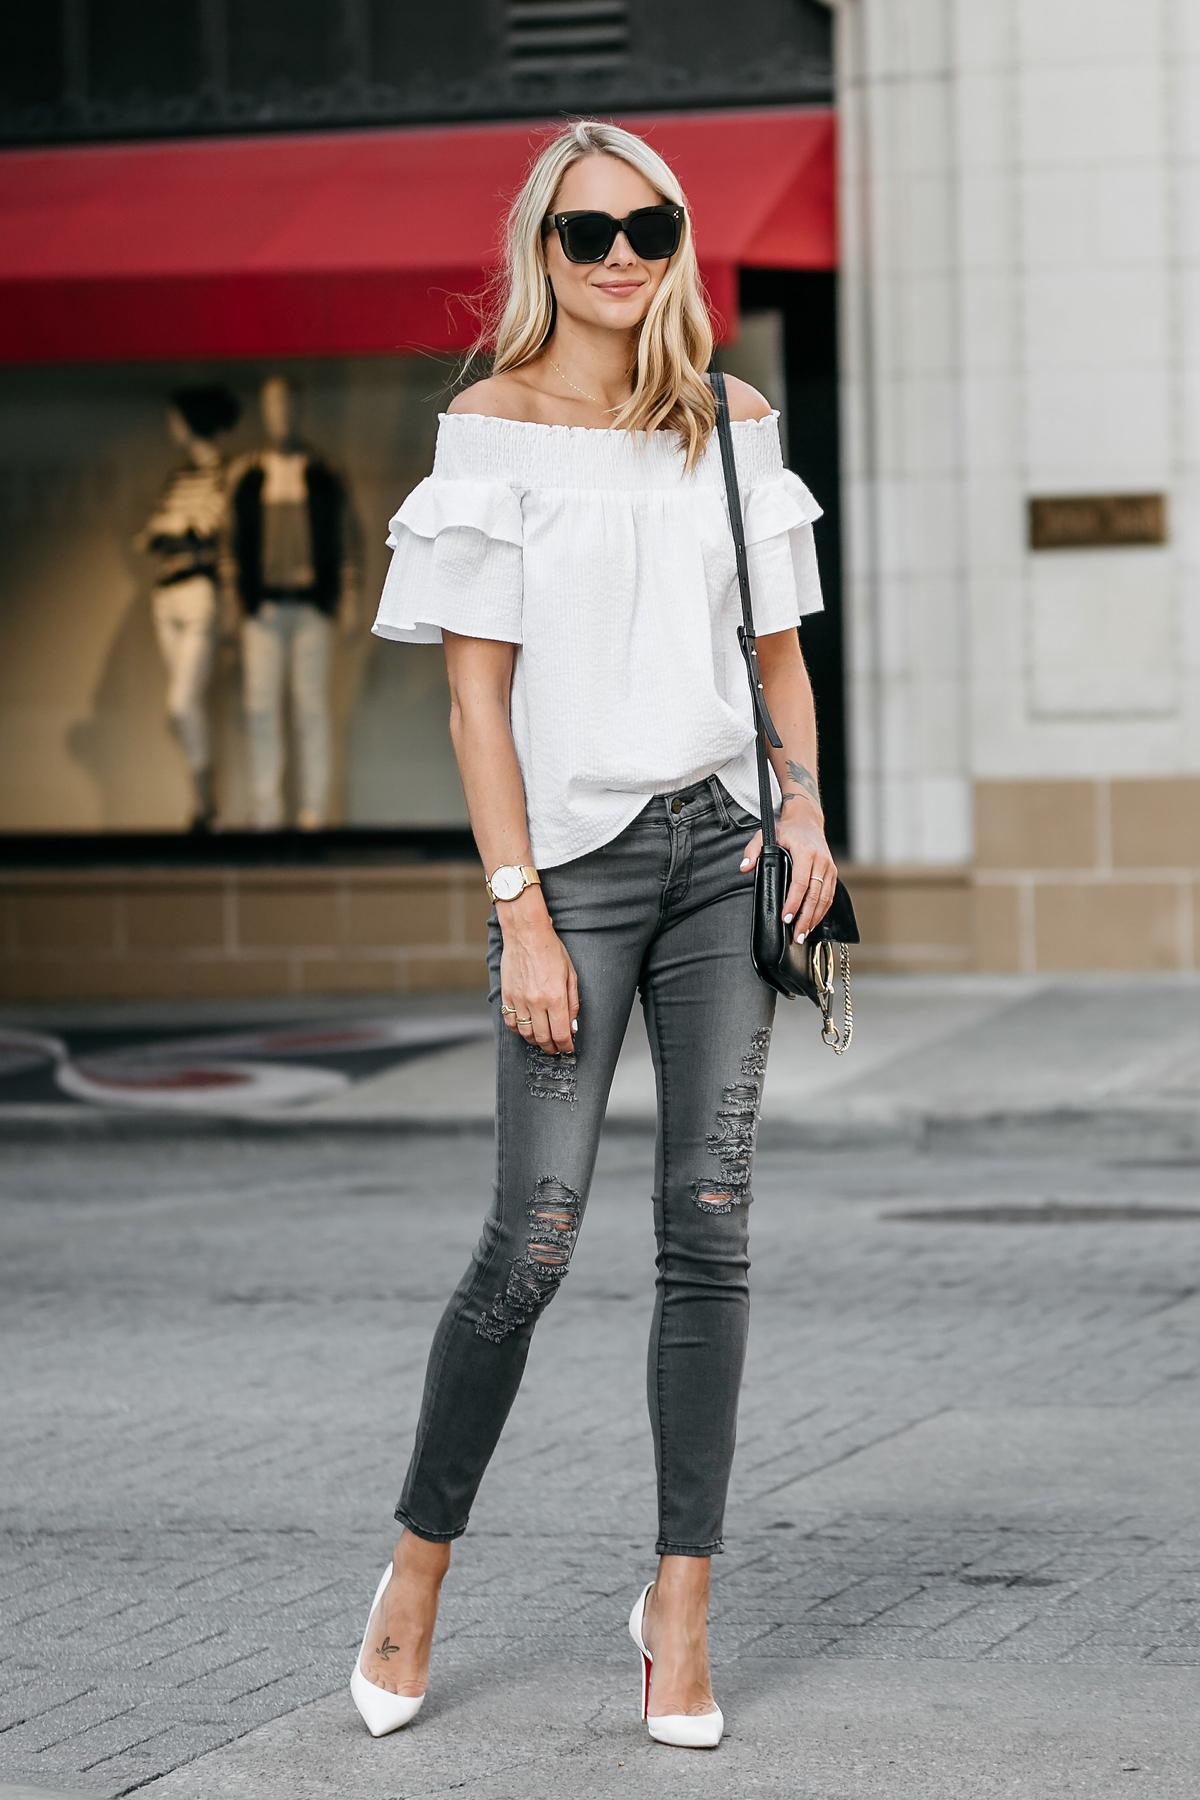 Fashion Jackson, Dallas Blogger, Fashion Blogger, Street Style, Nordstrom White Off-the-Shoulder Top, Frame Grey Ripped Skinny Jeans, Chloe Faye Black Handbag, Christian Louboutin White Pumps